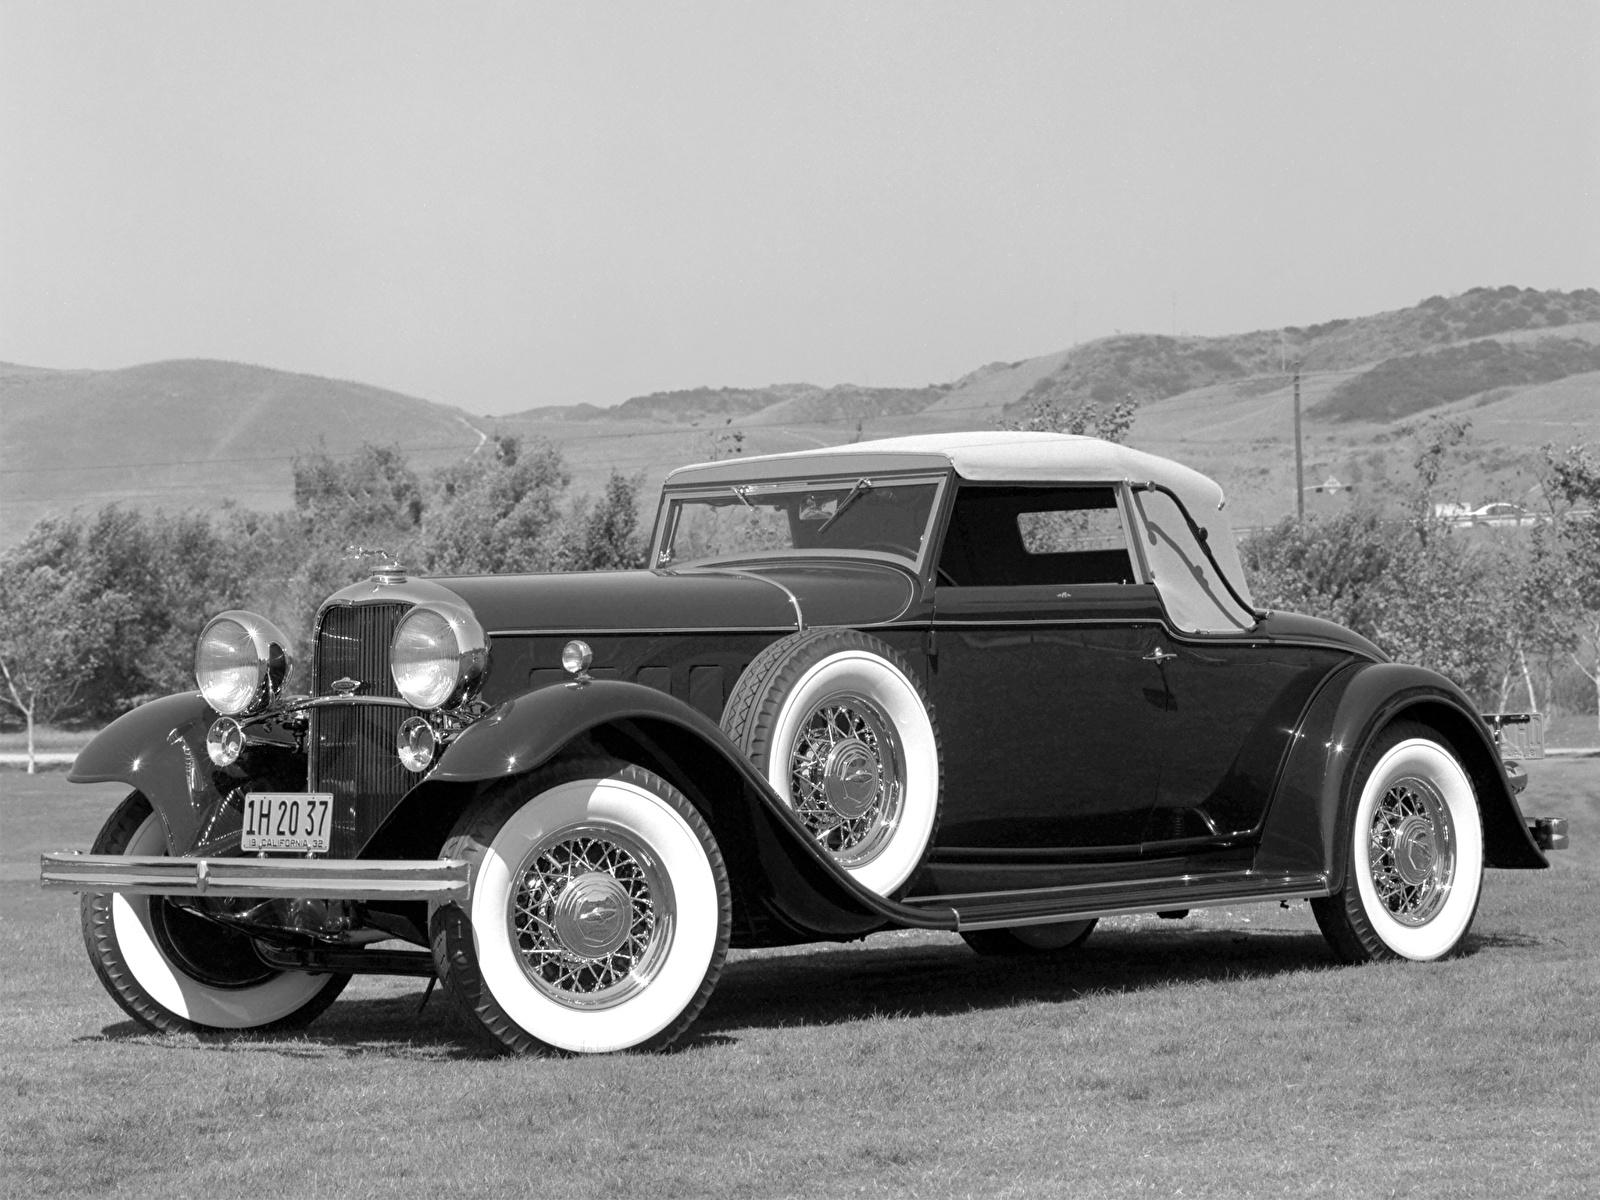 Фотографии Lincoln KB Convertible Roadster 1932 Родстер авто 1600x1200 машина машины автомобиль Автомобили